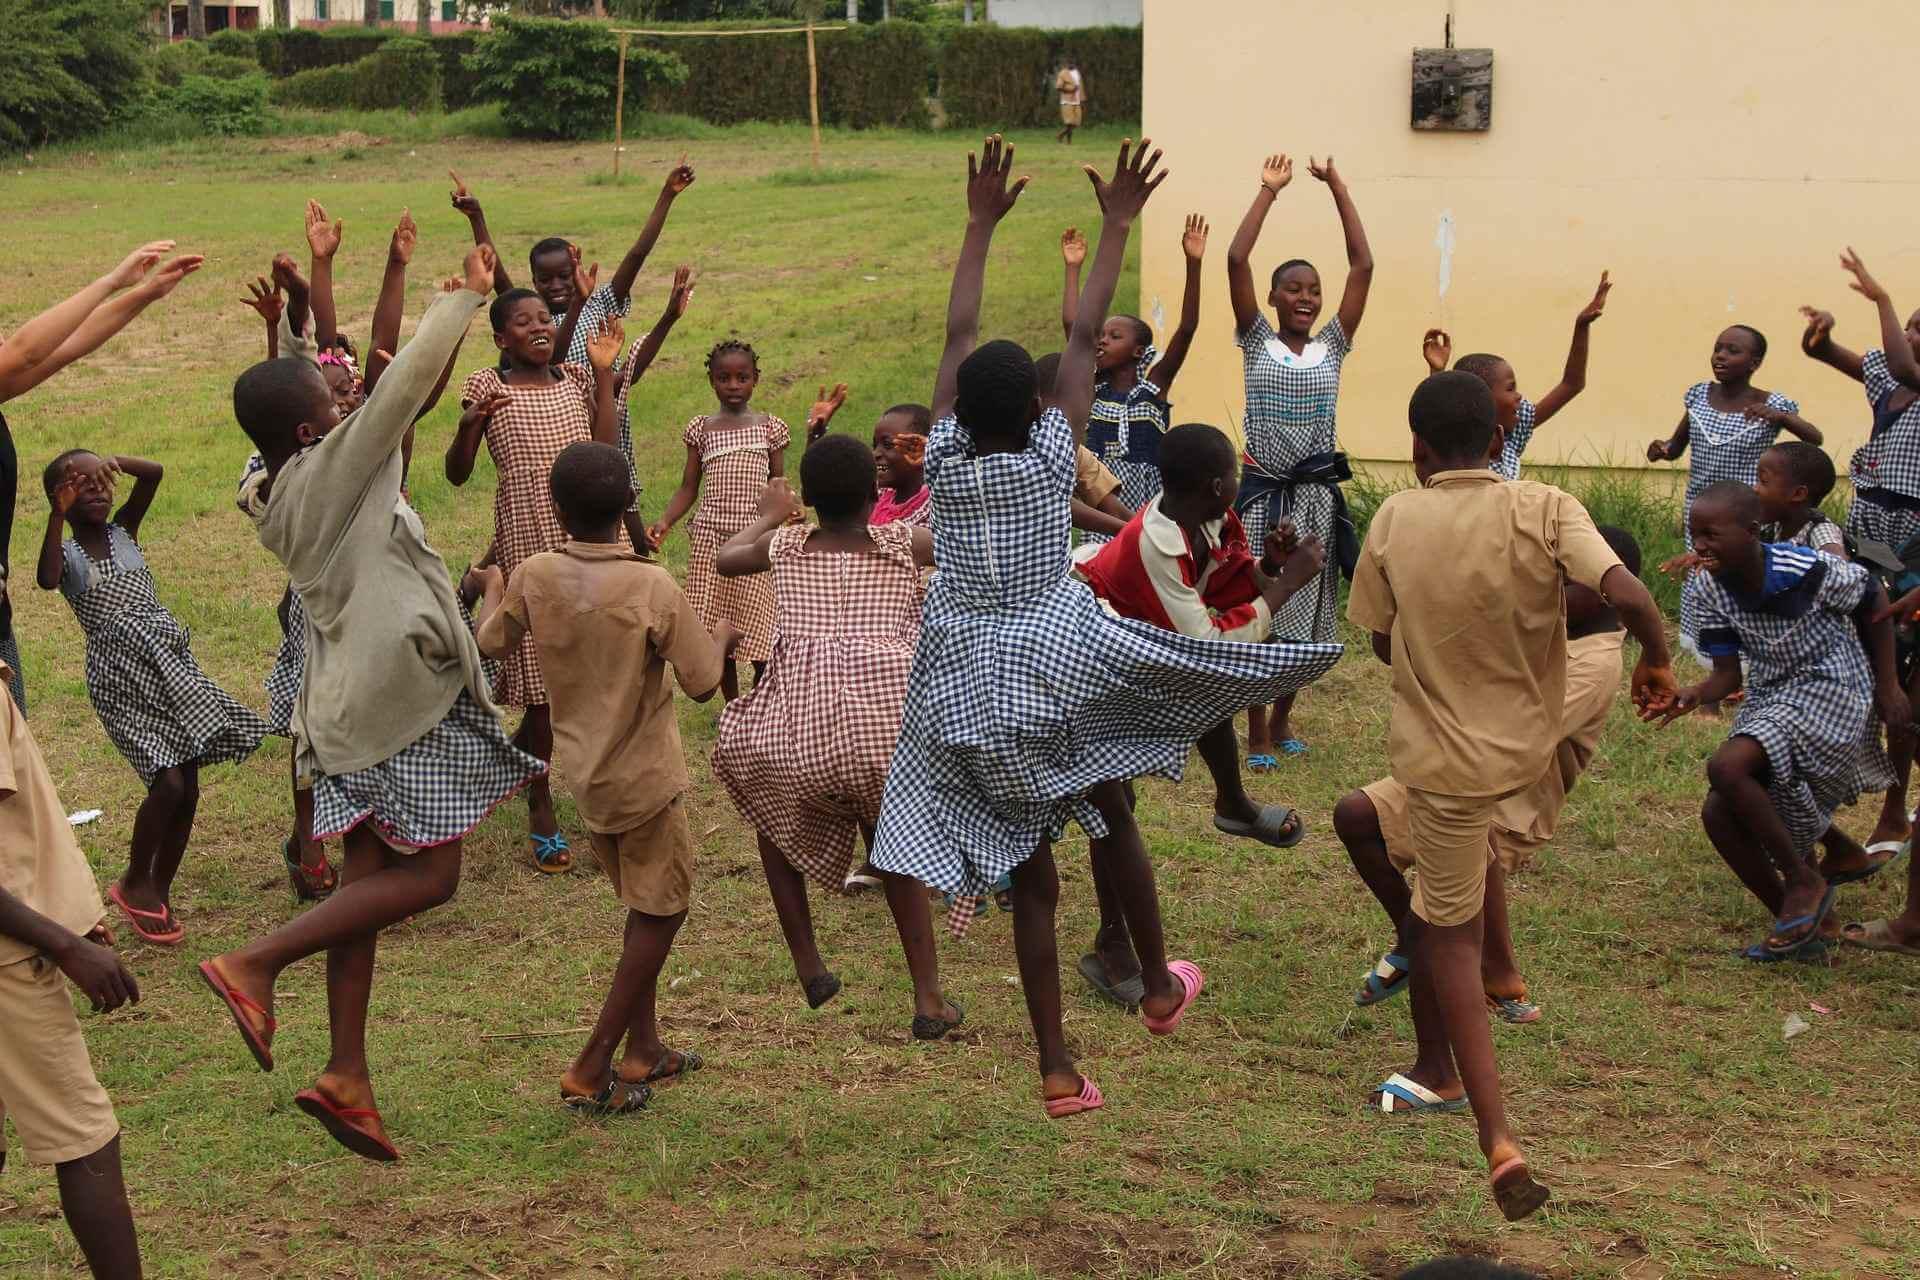 Ajimba supports social projects of the Kariega Foundation